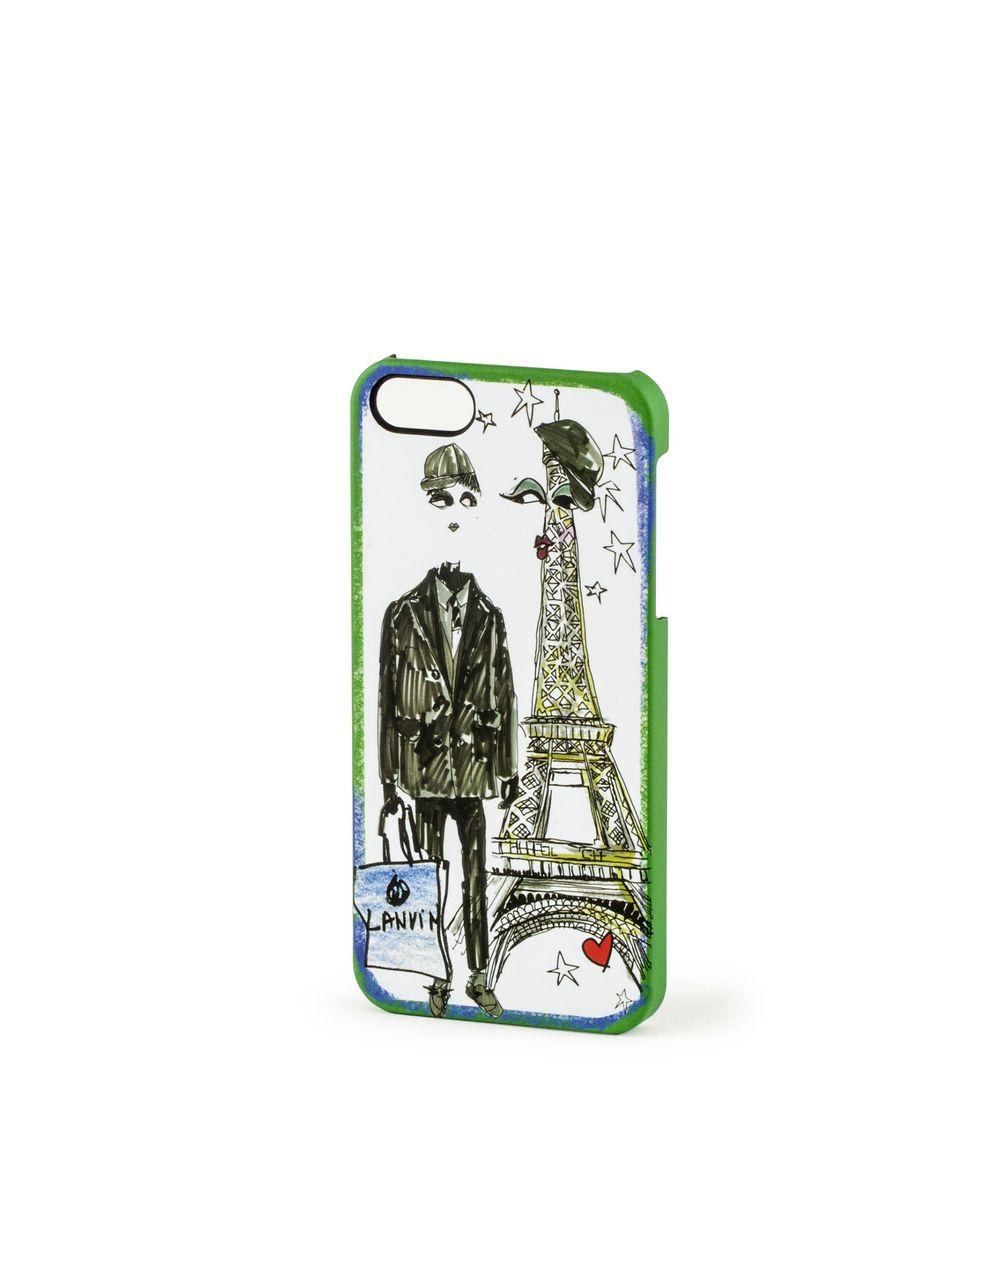 Male sketch iPhone 5 case - Lanvin